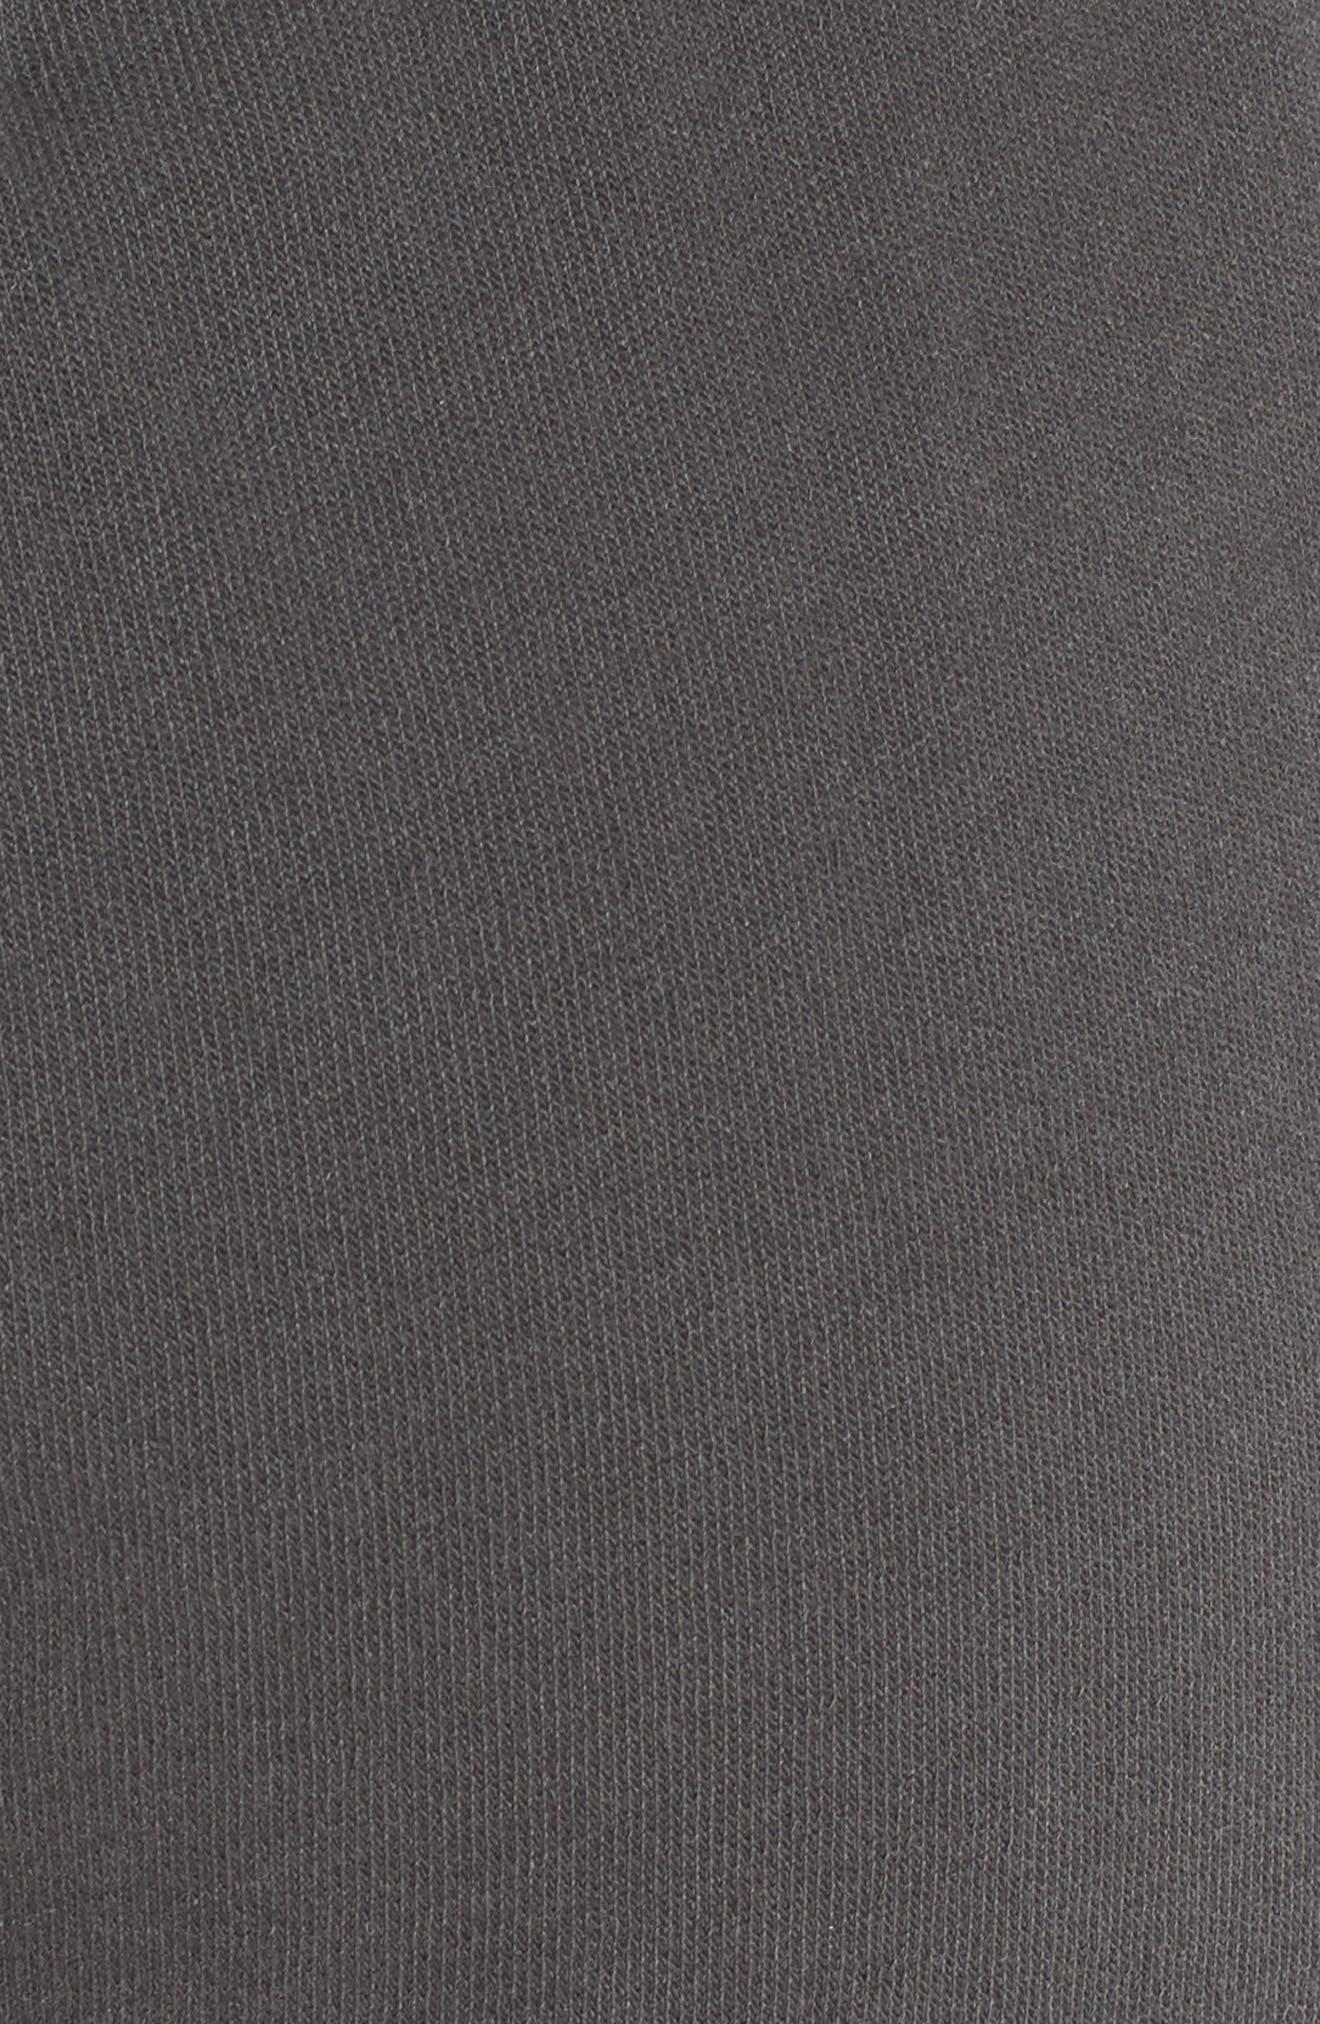 Rainbow Glitz Shorts,                             Alternate thumbnail 6, color,                             Pigment Black